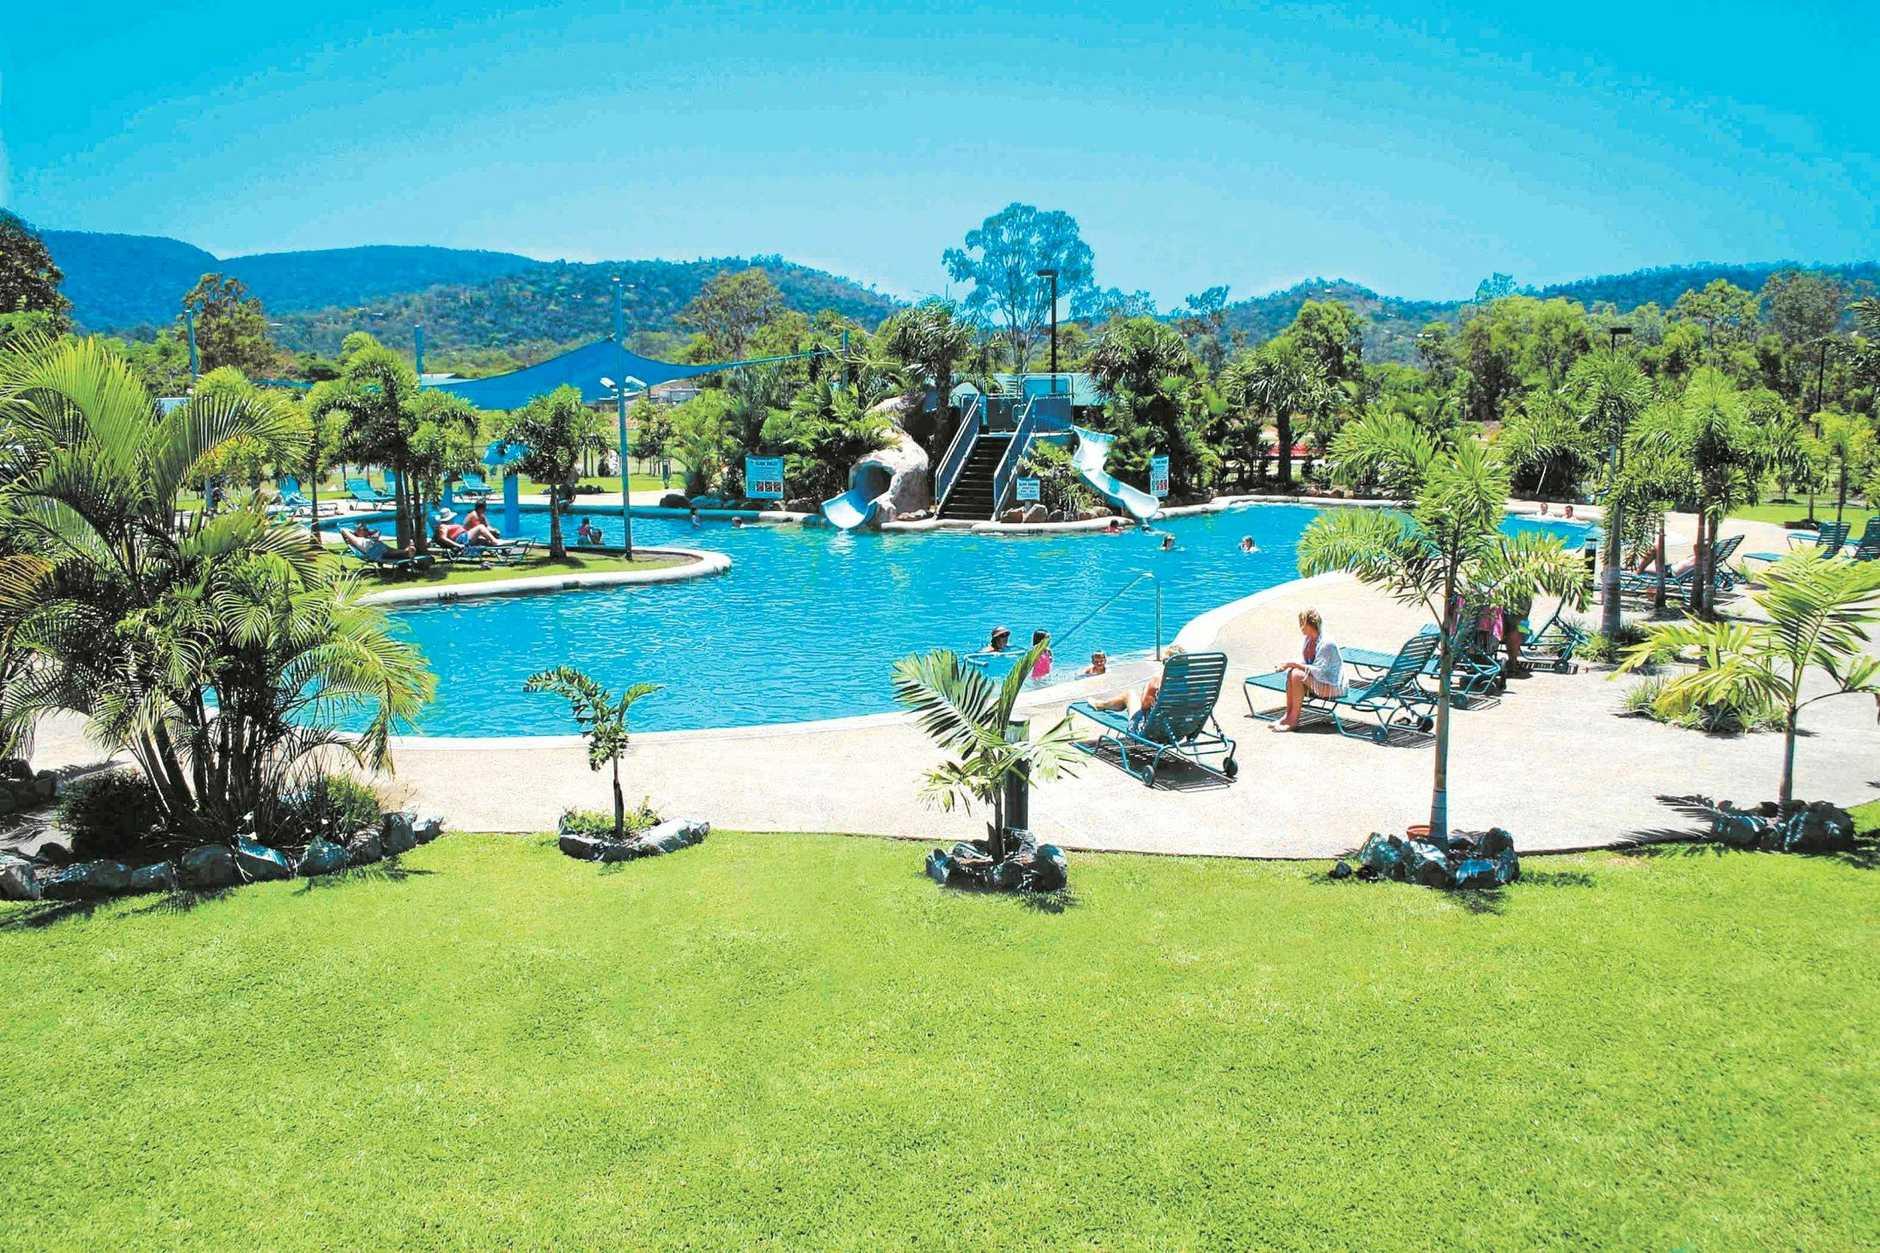 BIG4 Adventure Whitsunday Resort won gold at the Australian Tourism Awards in Launceston on Friday night.